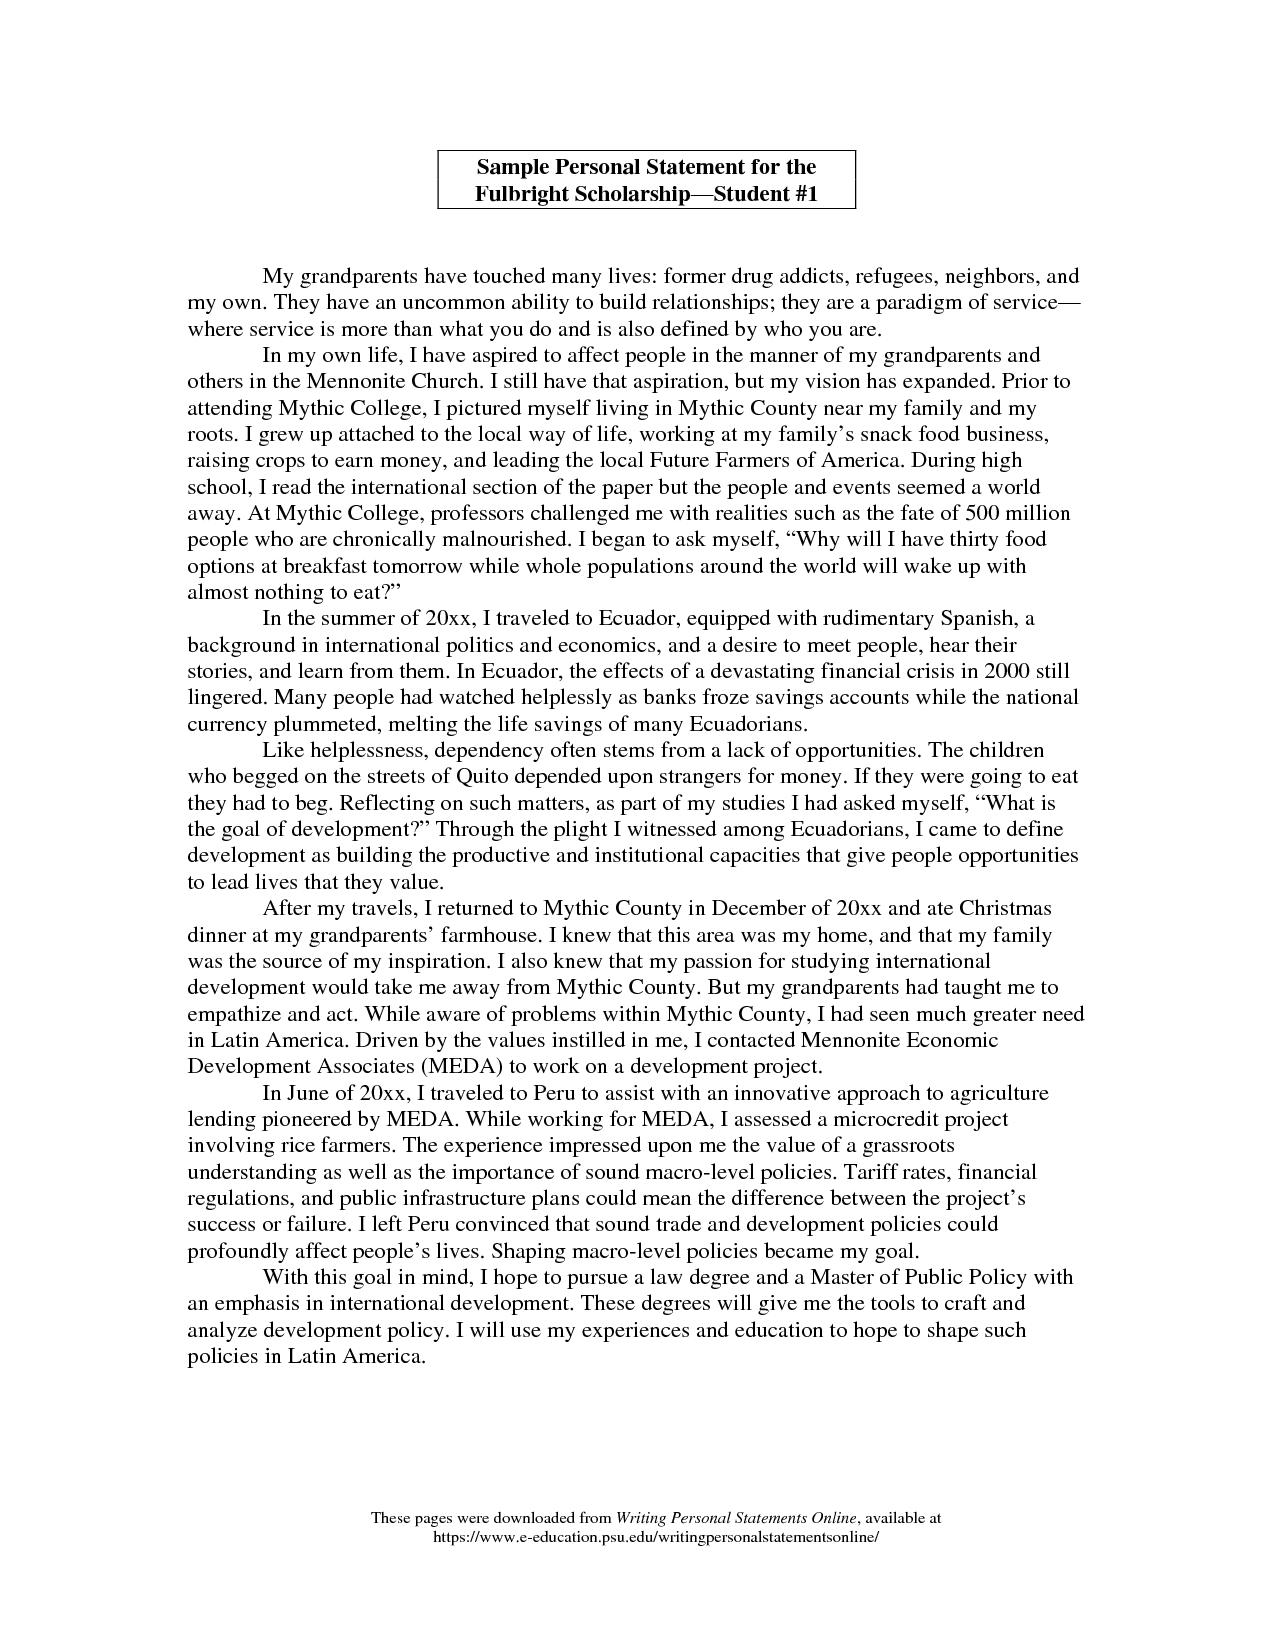 analytical essay engelsk studieportalen